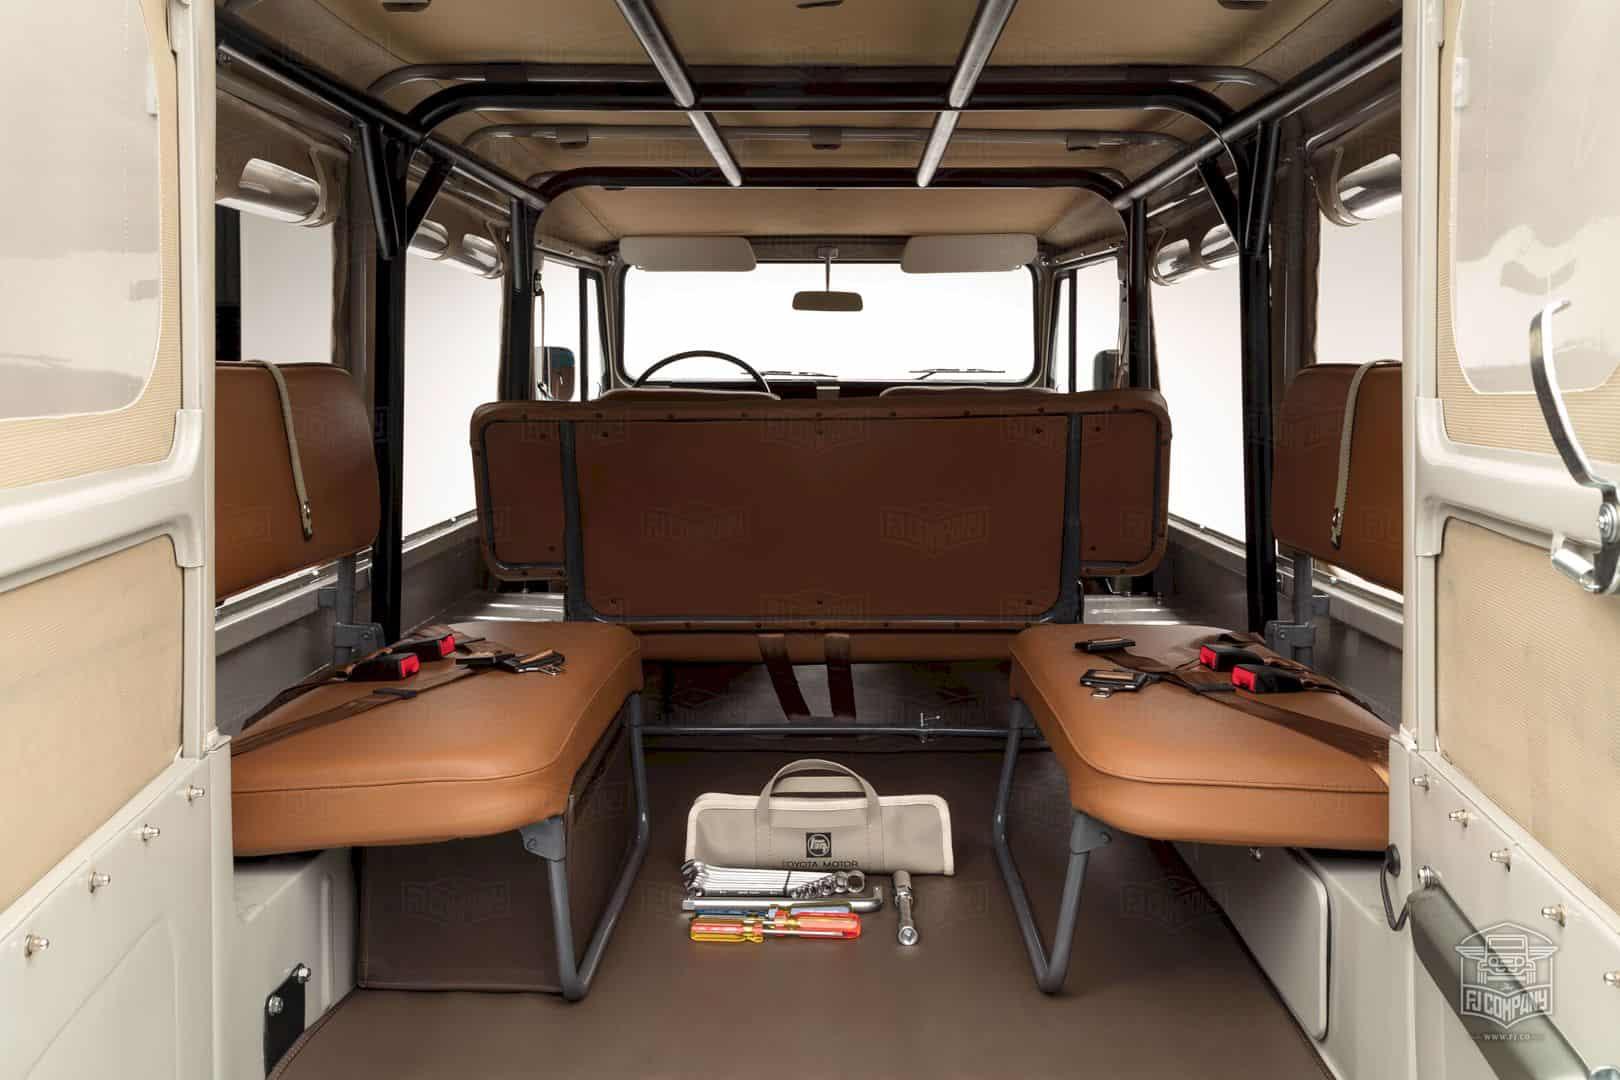 1981 Toyota Land Cruiser Fj45 Beige 3